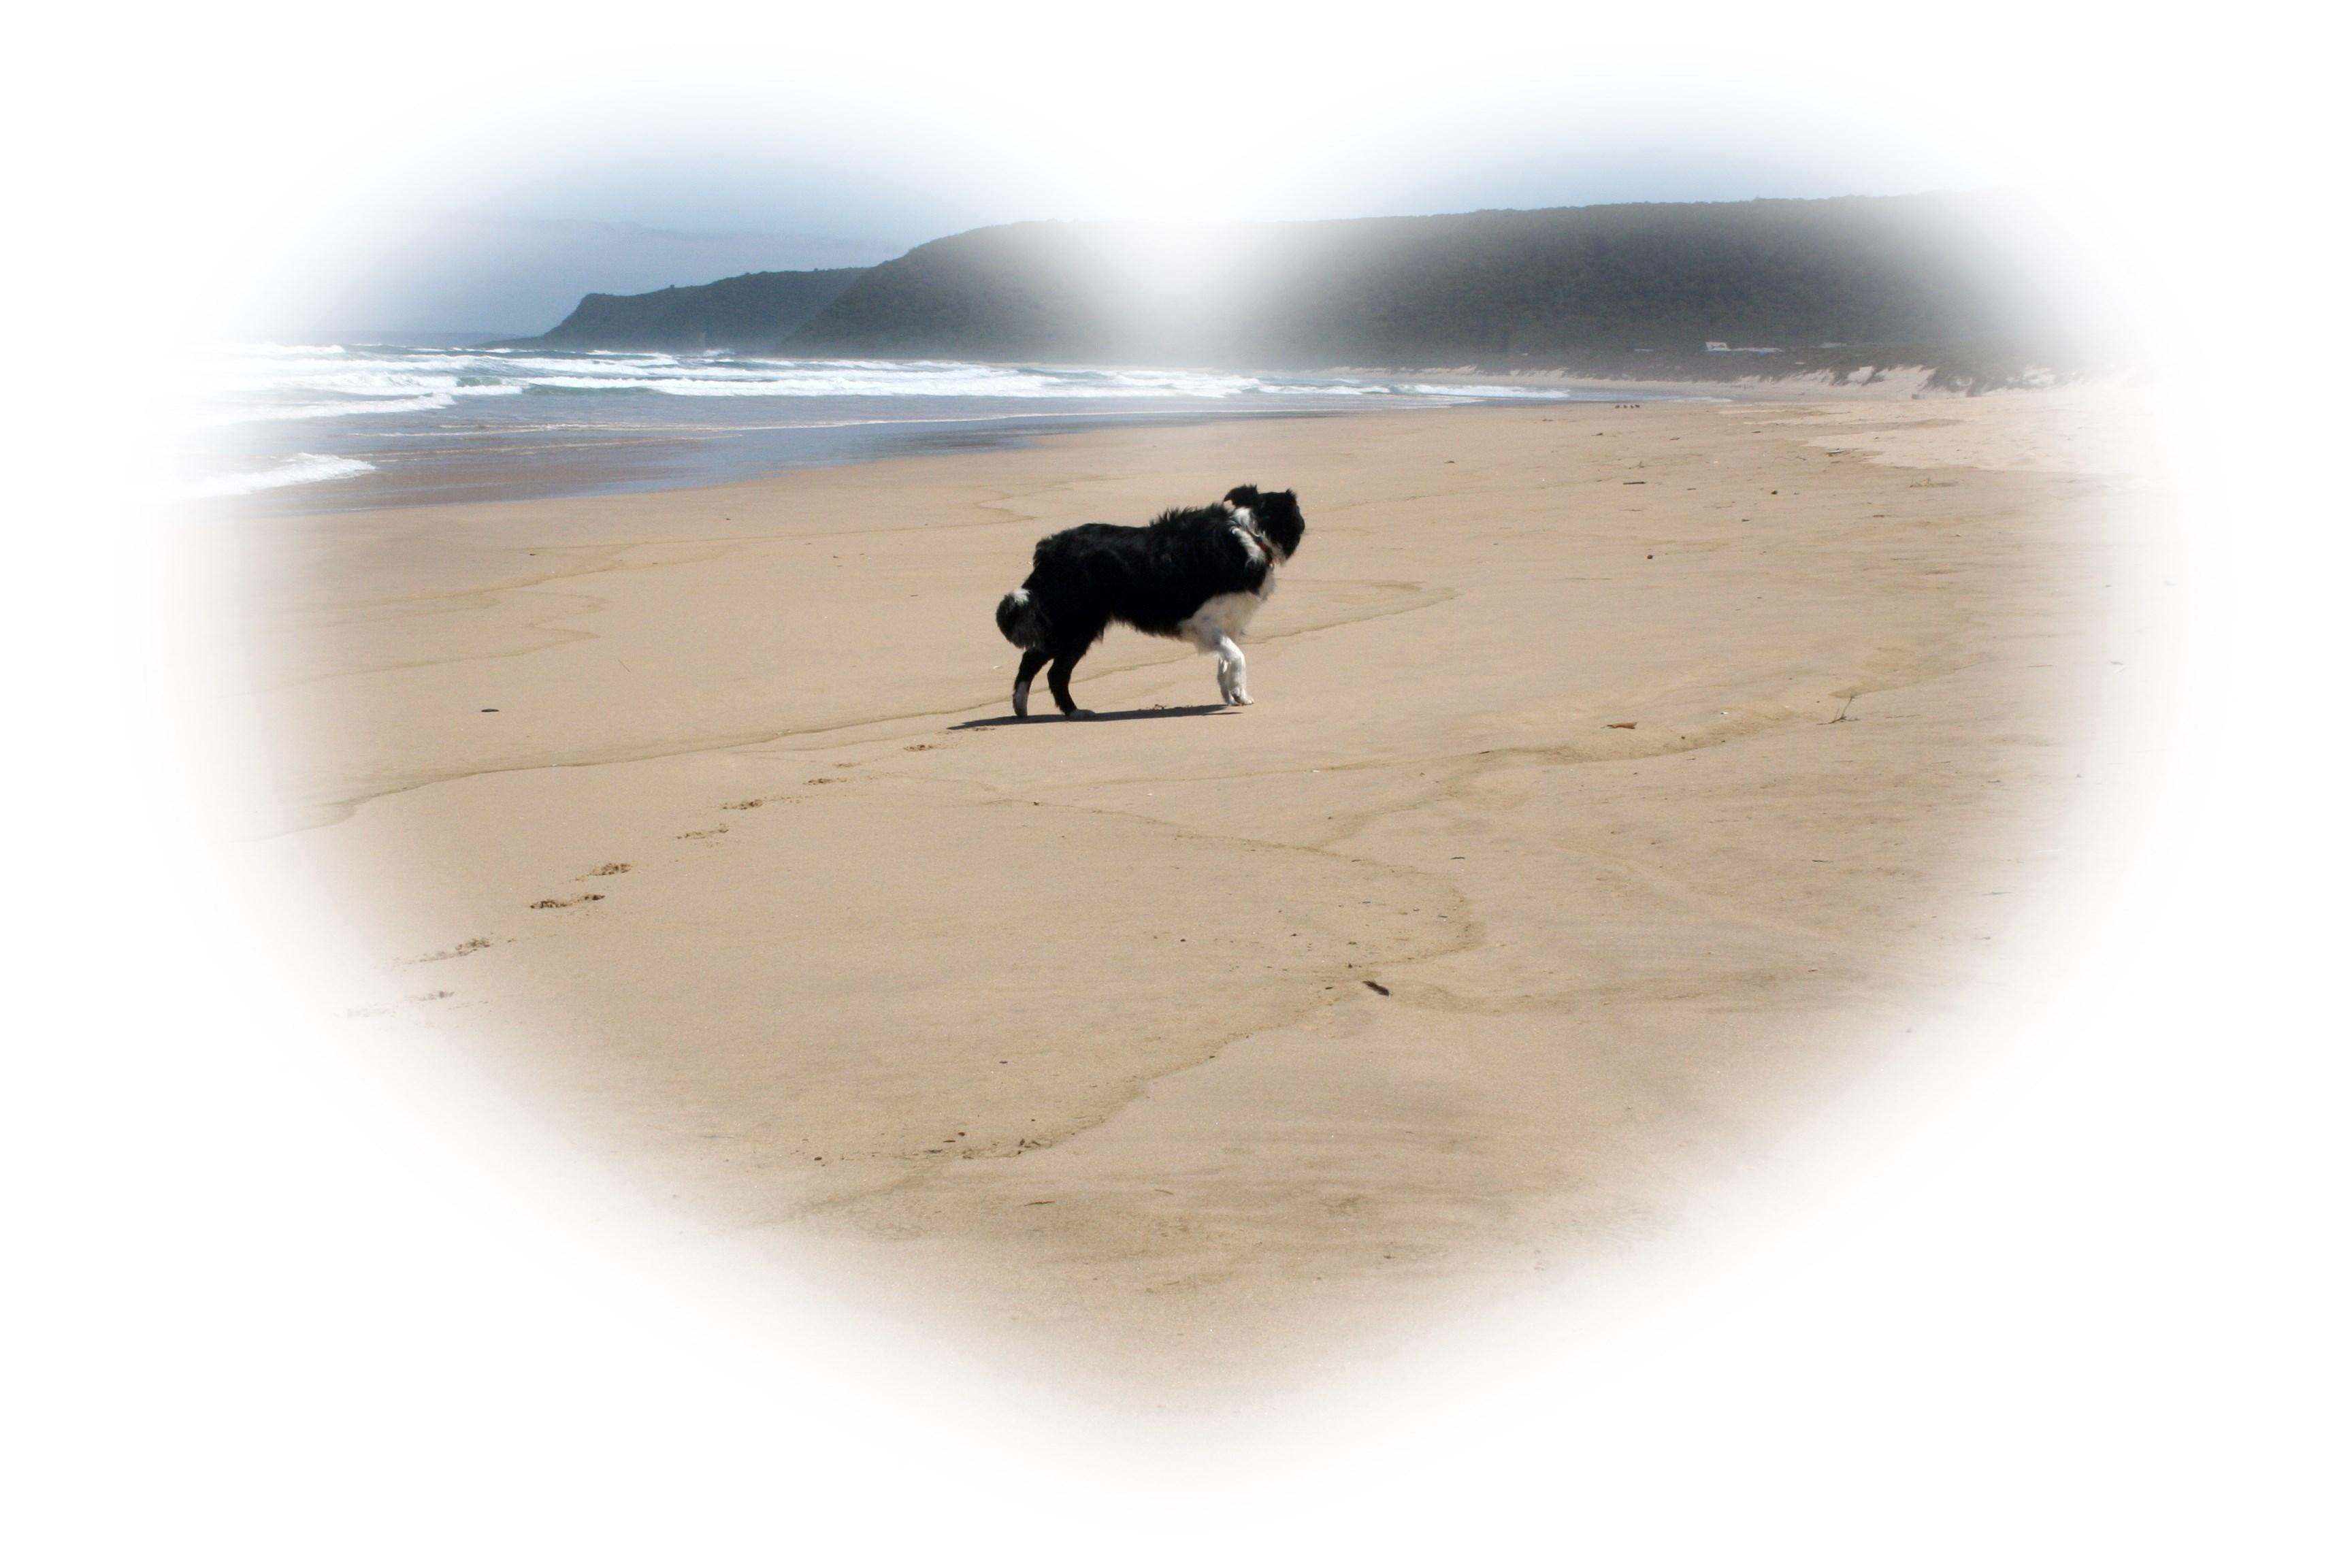 tpotg-jess-on-the-beach-02